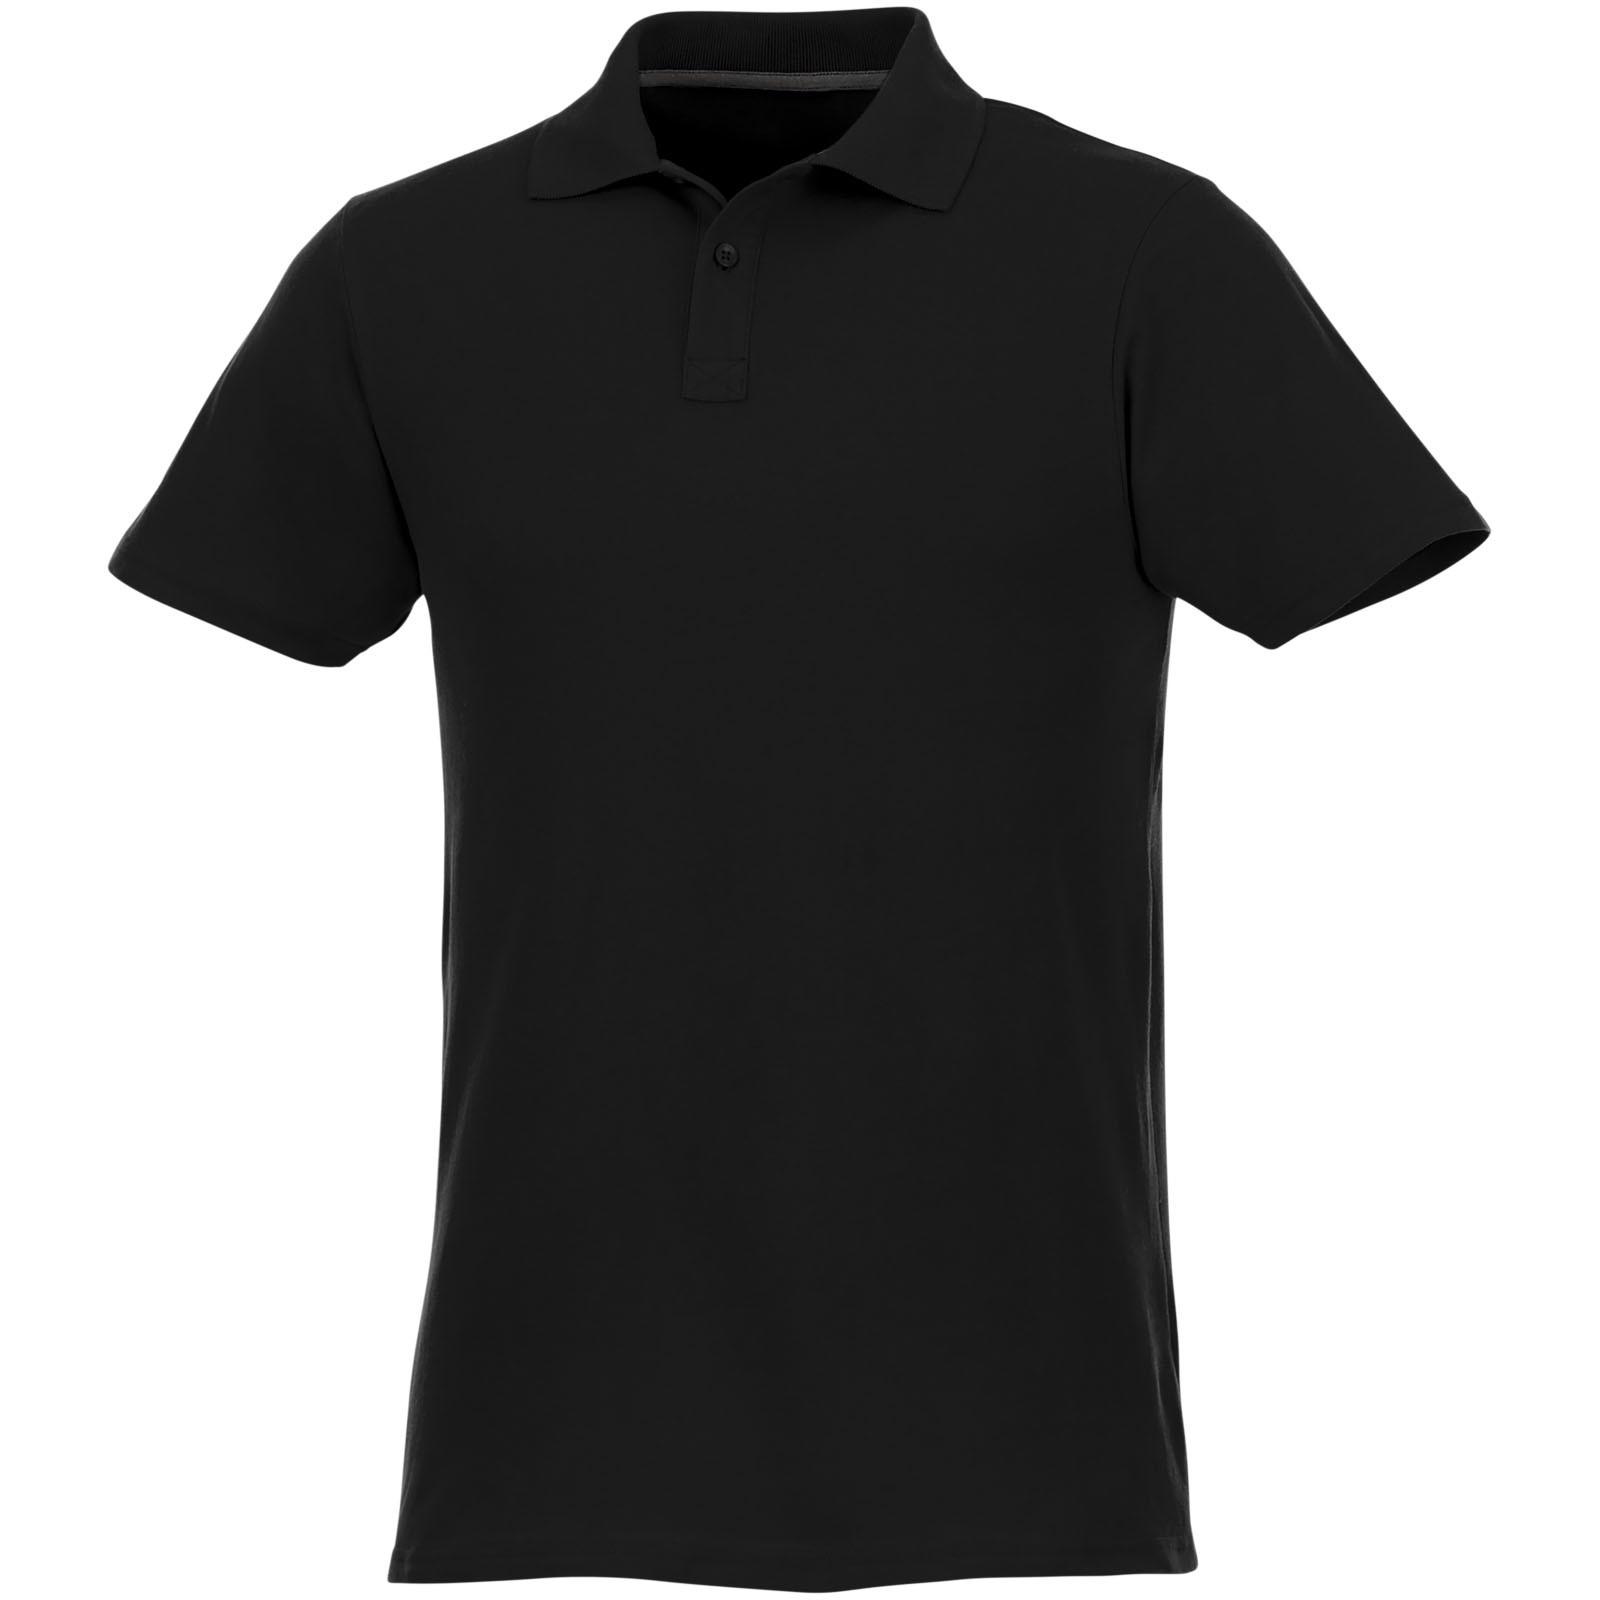 Helios short sleeve men's polo - Solid black / 5XL